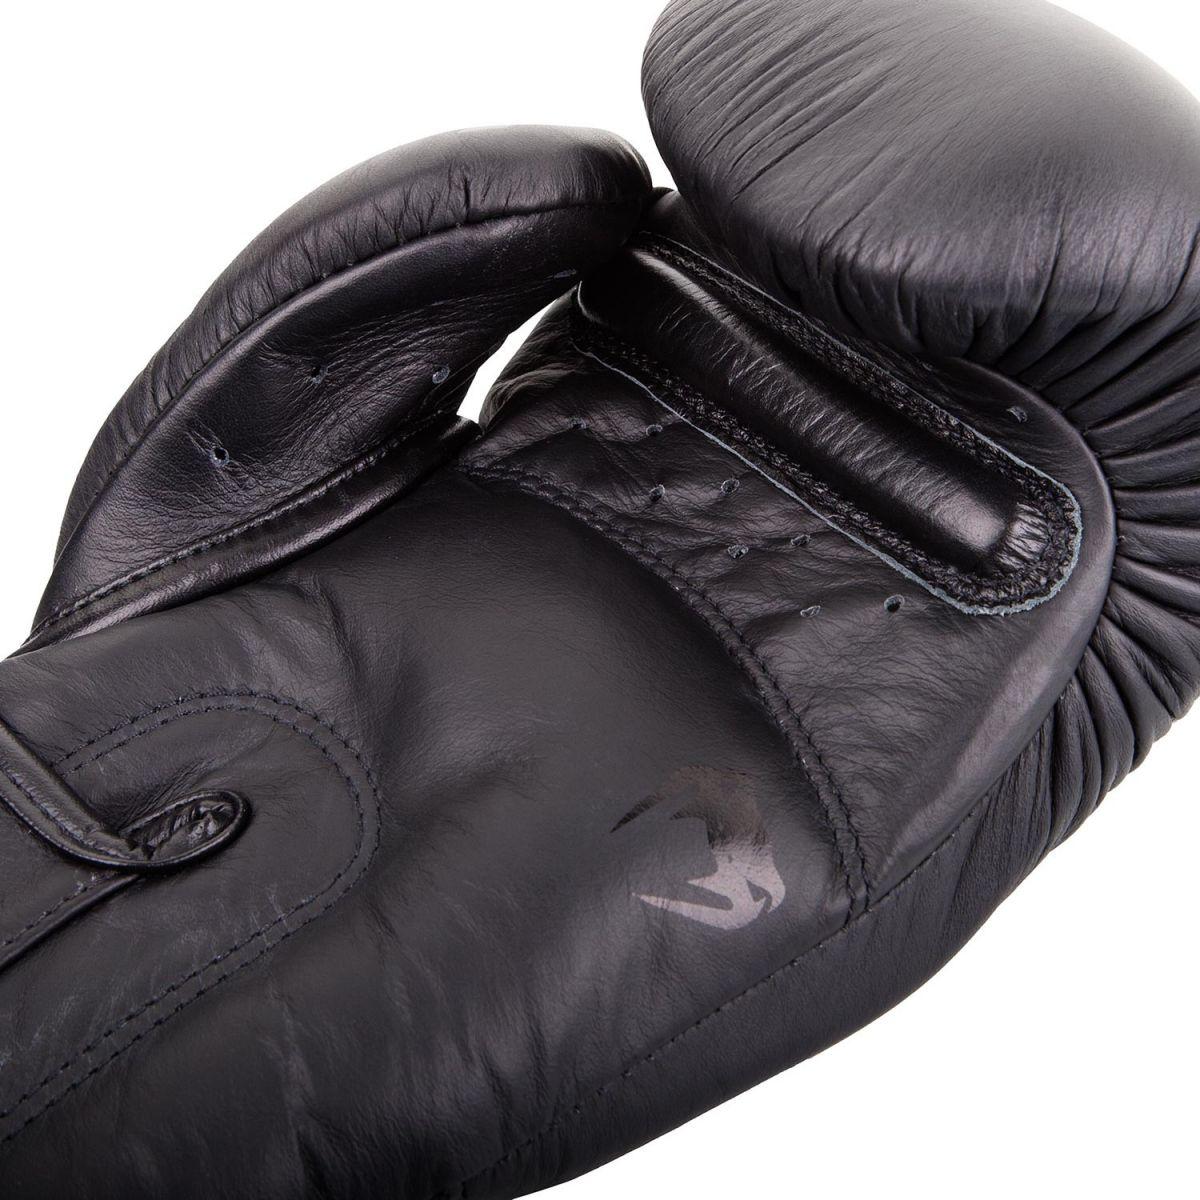 Перчатки Venum Giant 3.0 Boxing Gloves Black/Black-10